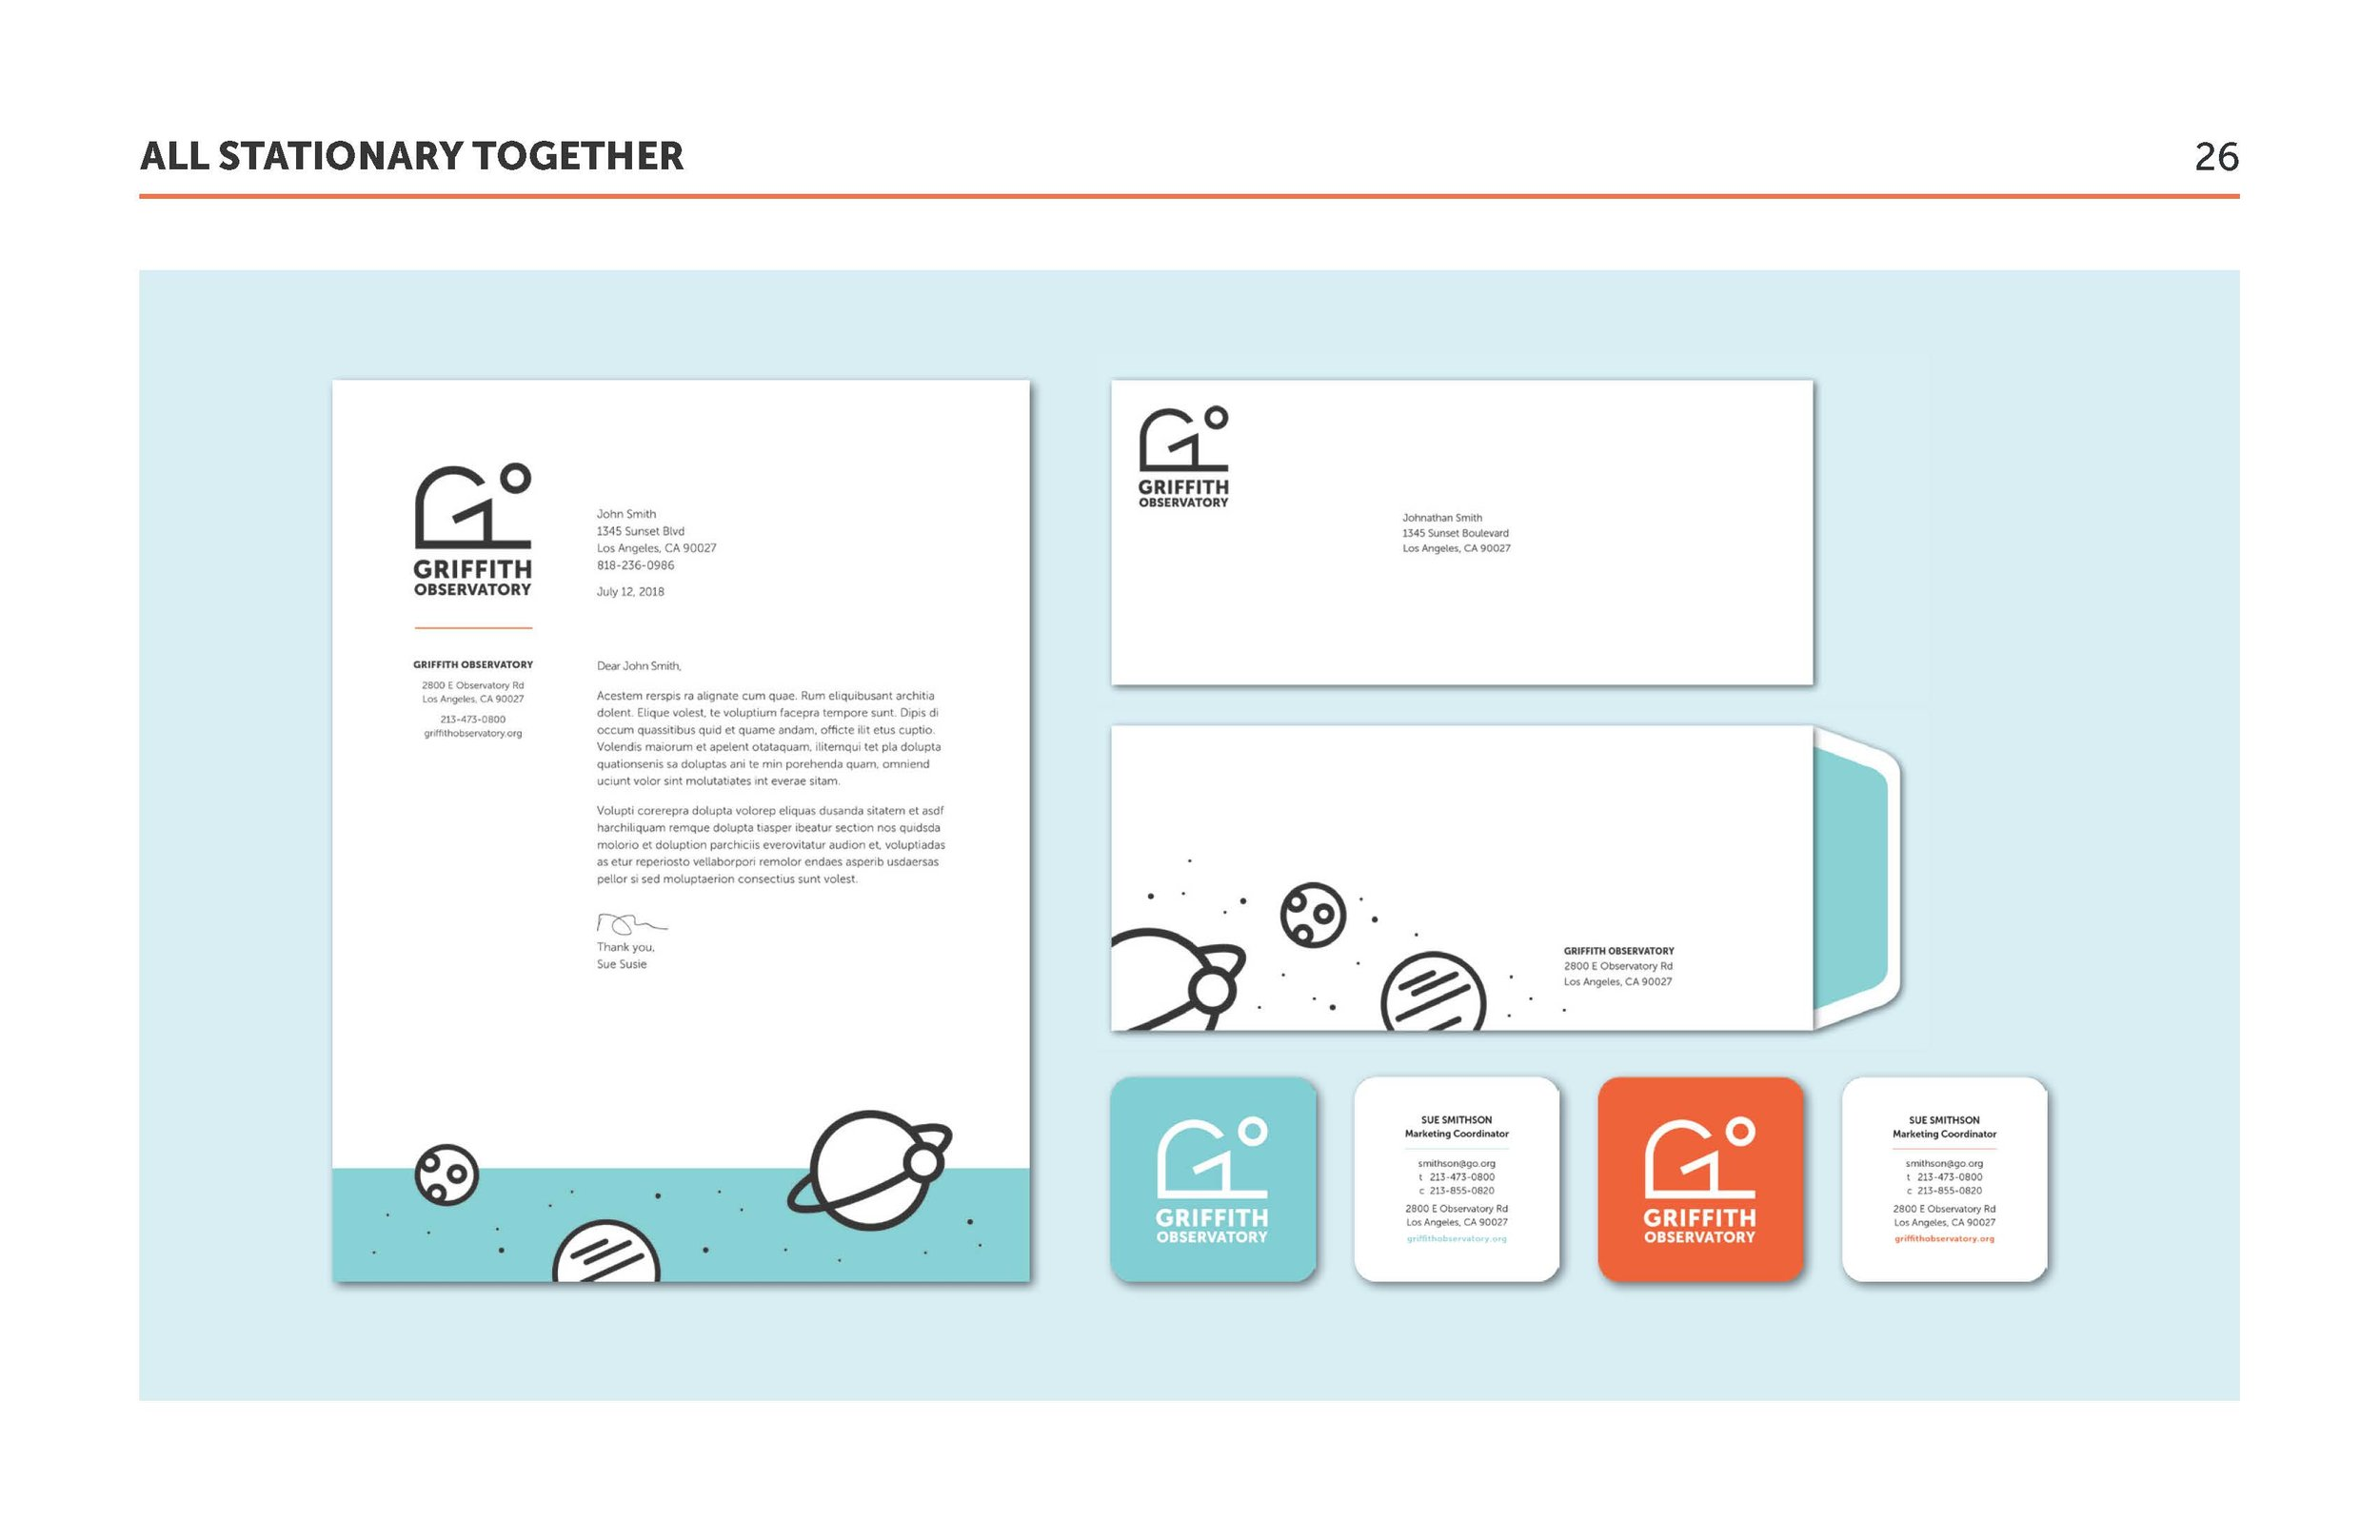 FinalPresentation_Page_26.jpg